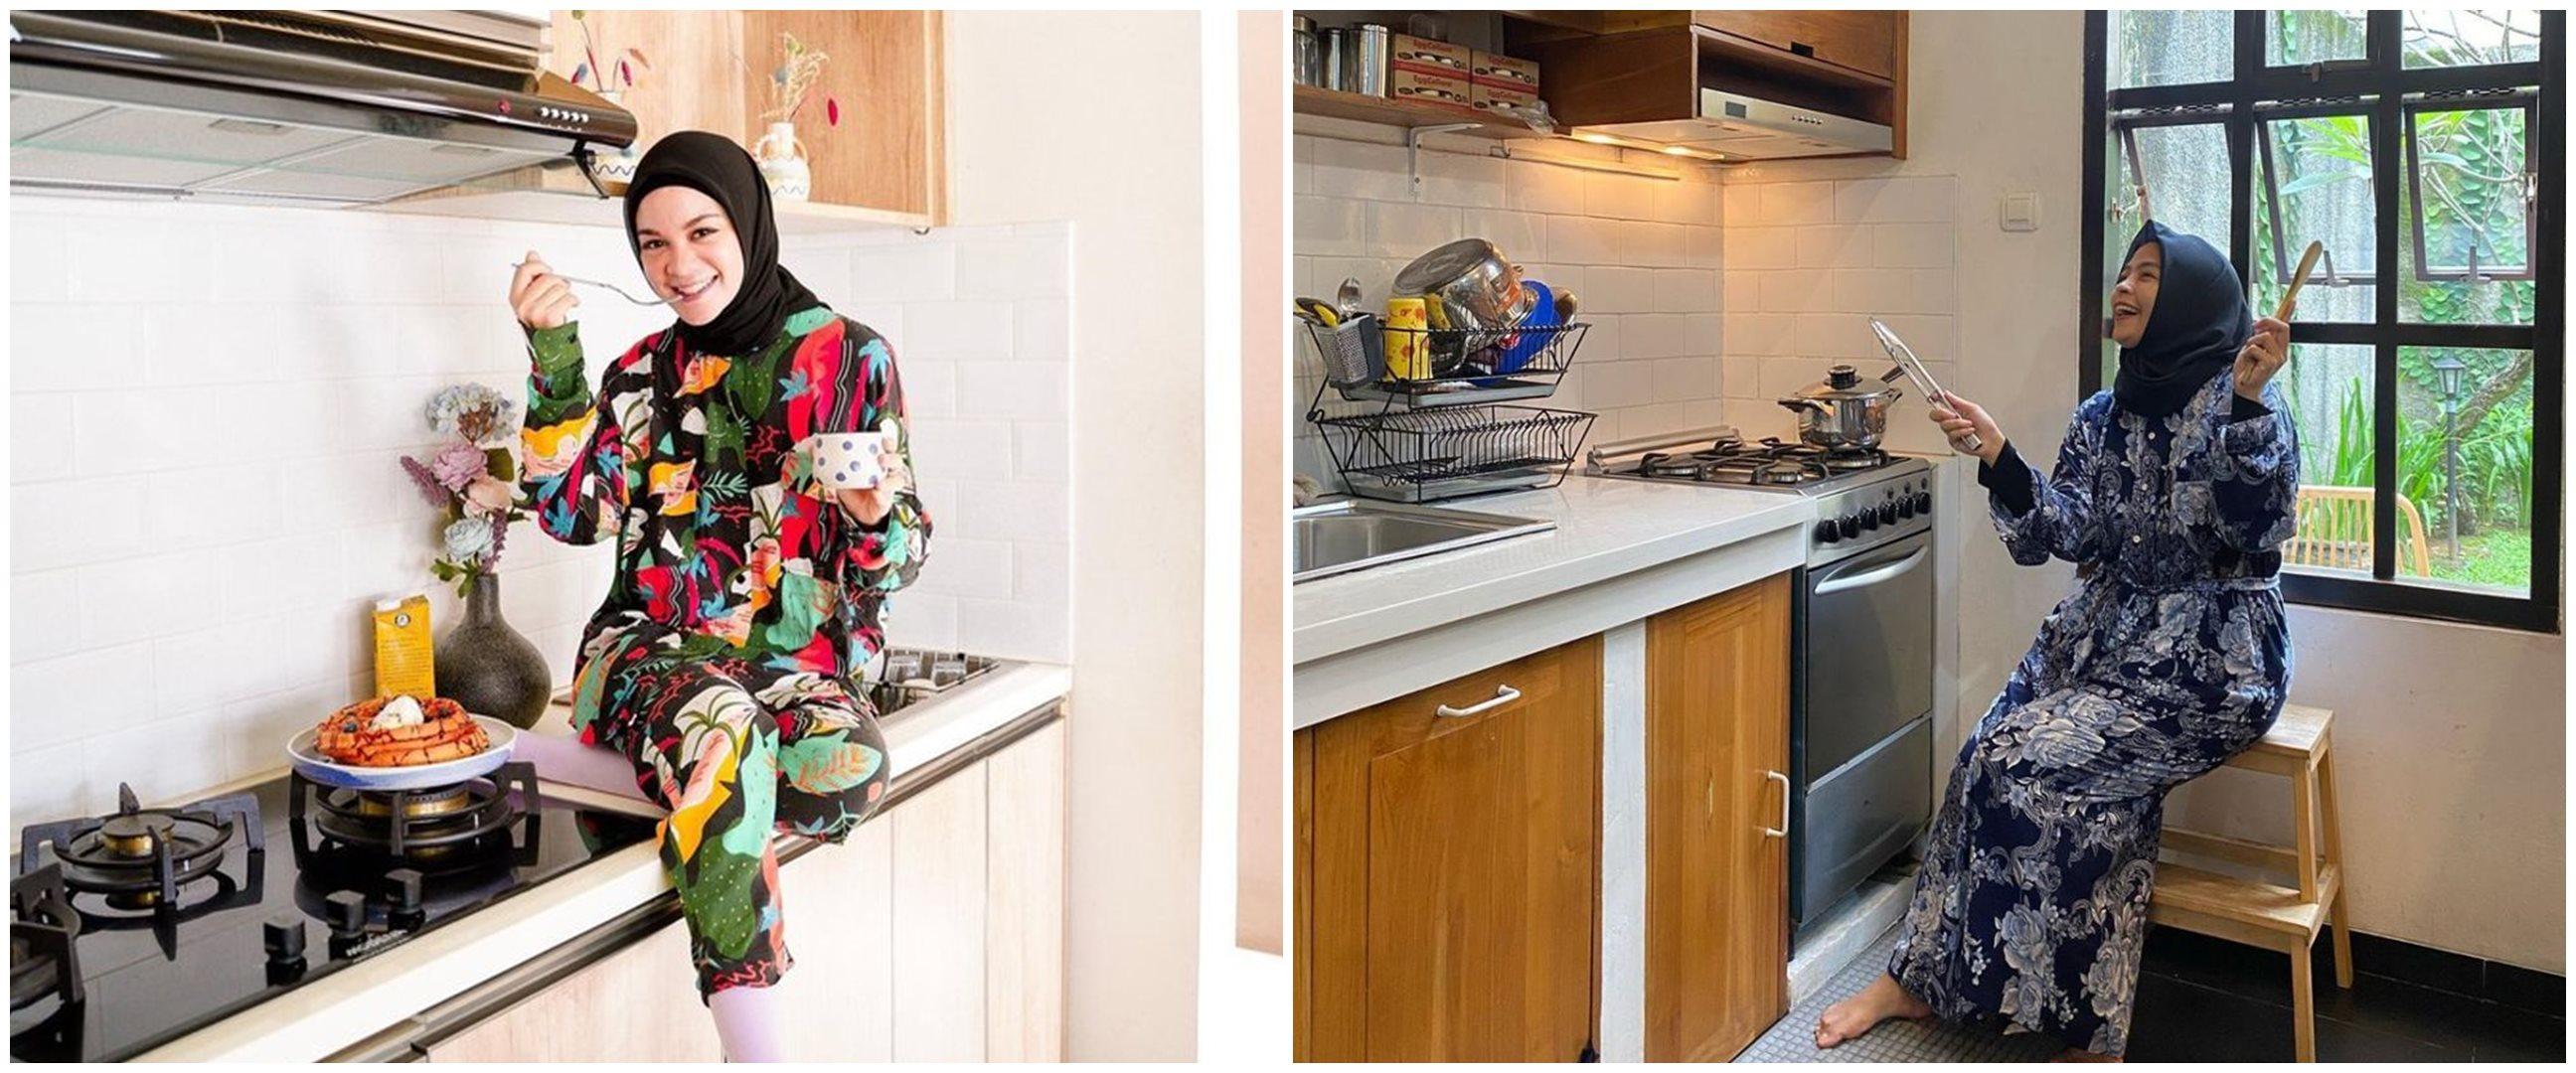 Gaya 9 seleb berhijab saat pemotretan di dapur, simpel tapi kece abis